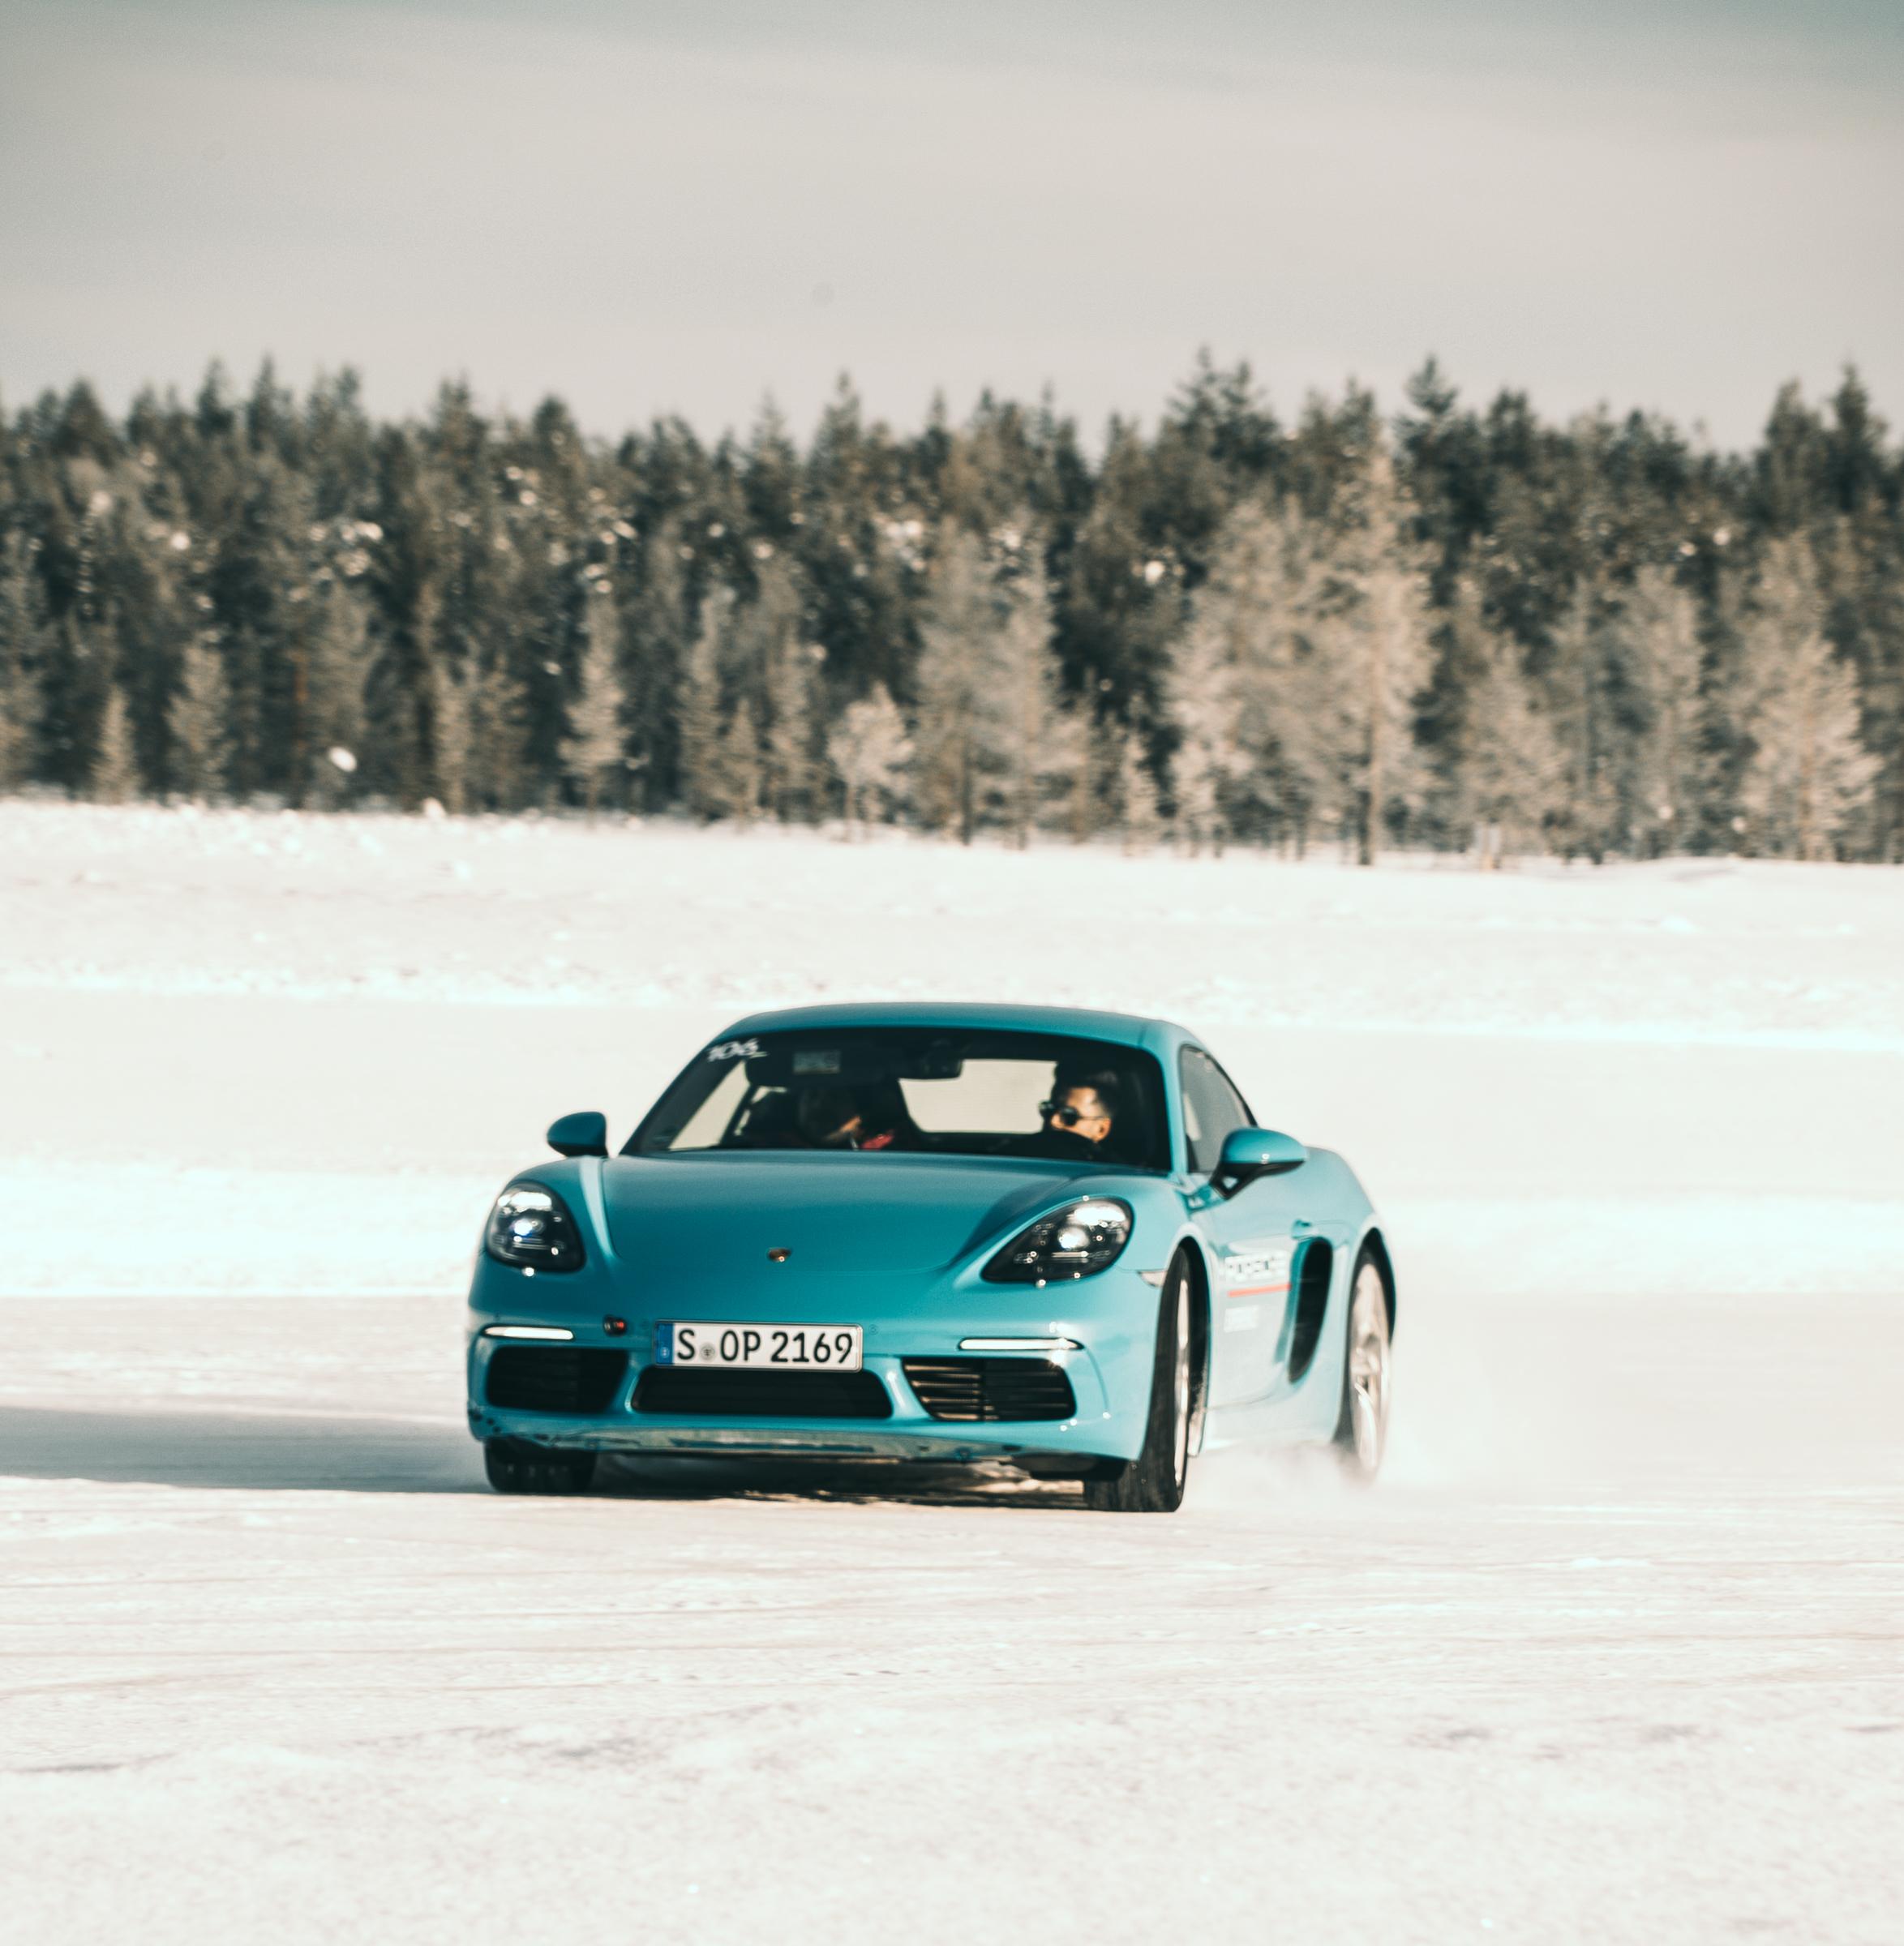 Tommeezjerry-Lifestyleblog-Fashionblog-Maennermodeblog-Maennerblog-Modeblog-Porsche-Ice-Drive-Experience-Levi-Finland-911-Drifting-Winterwonderland-Cars-Driving-School